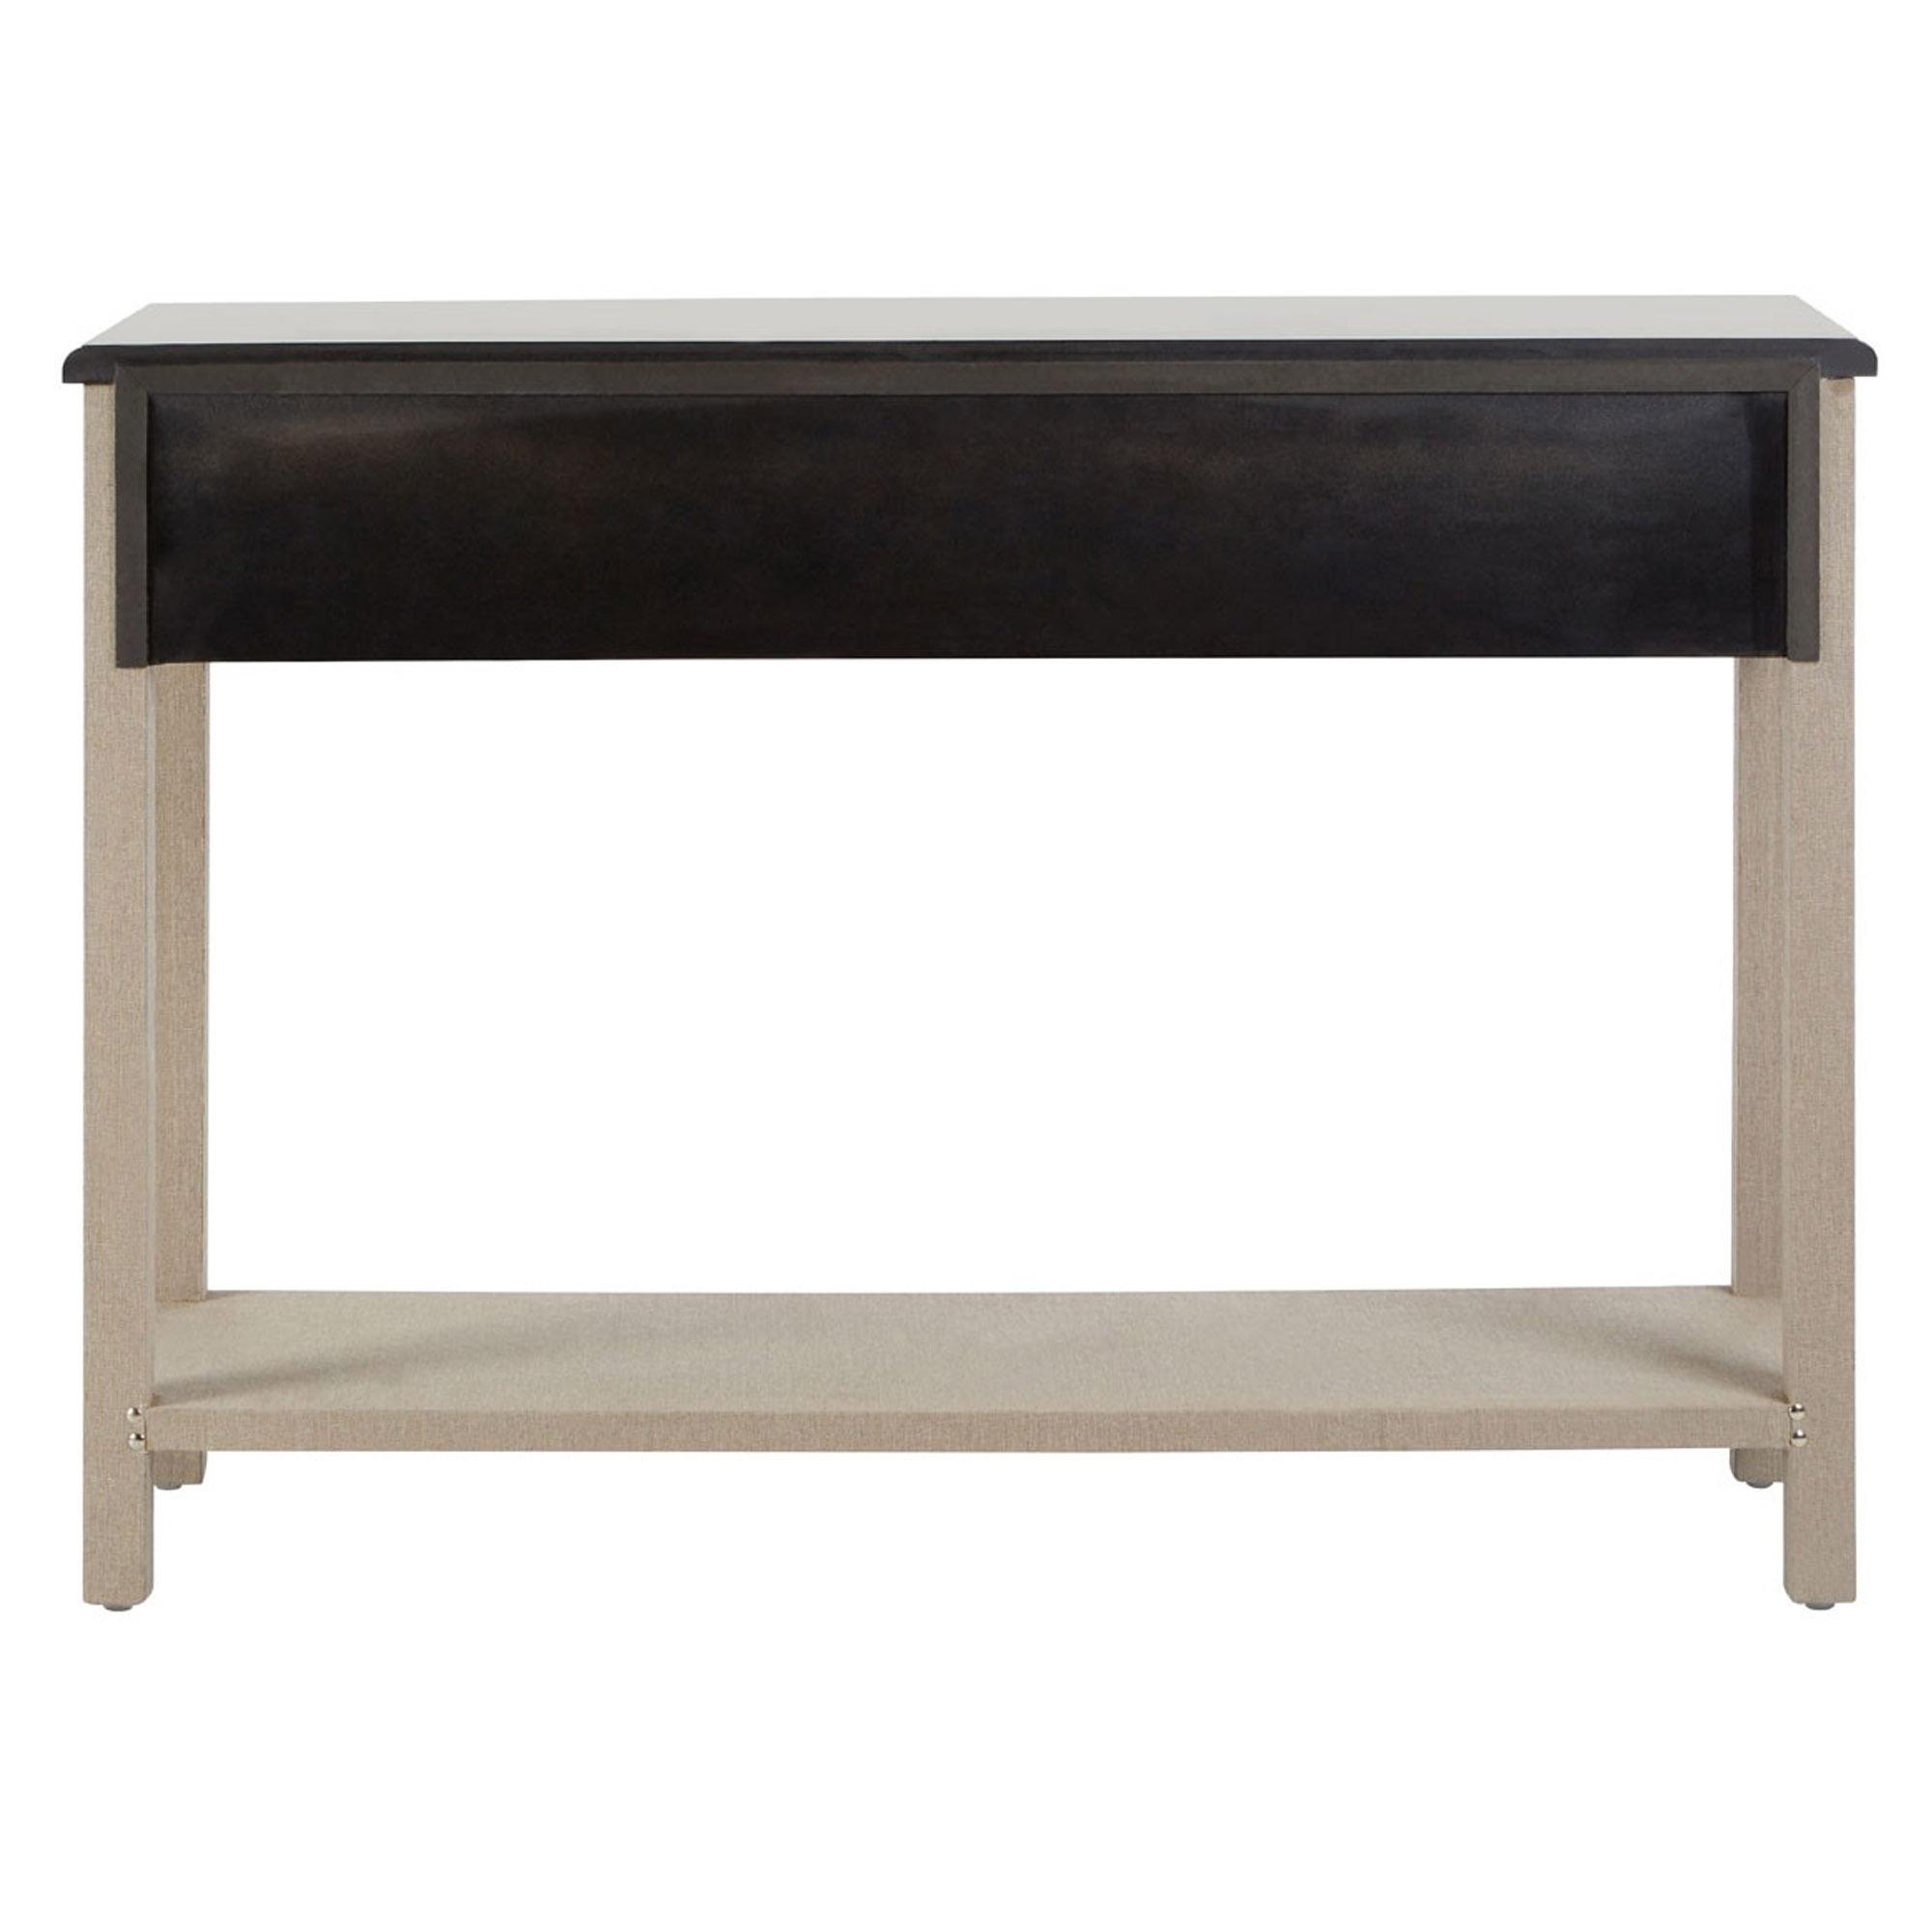 Amazing Manhattan 3 Drawer Console Table Interior Design Ideas Oxytryabchikinfo